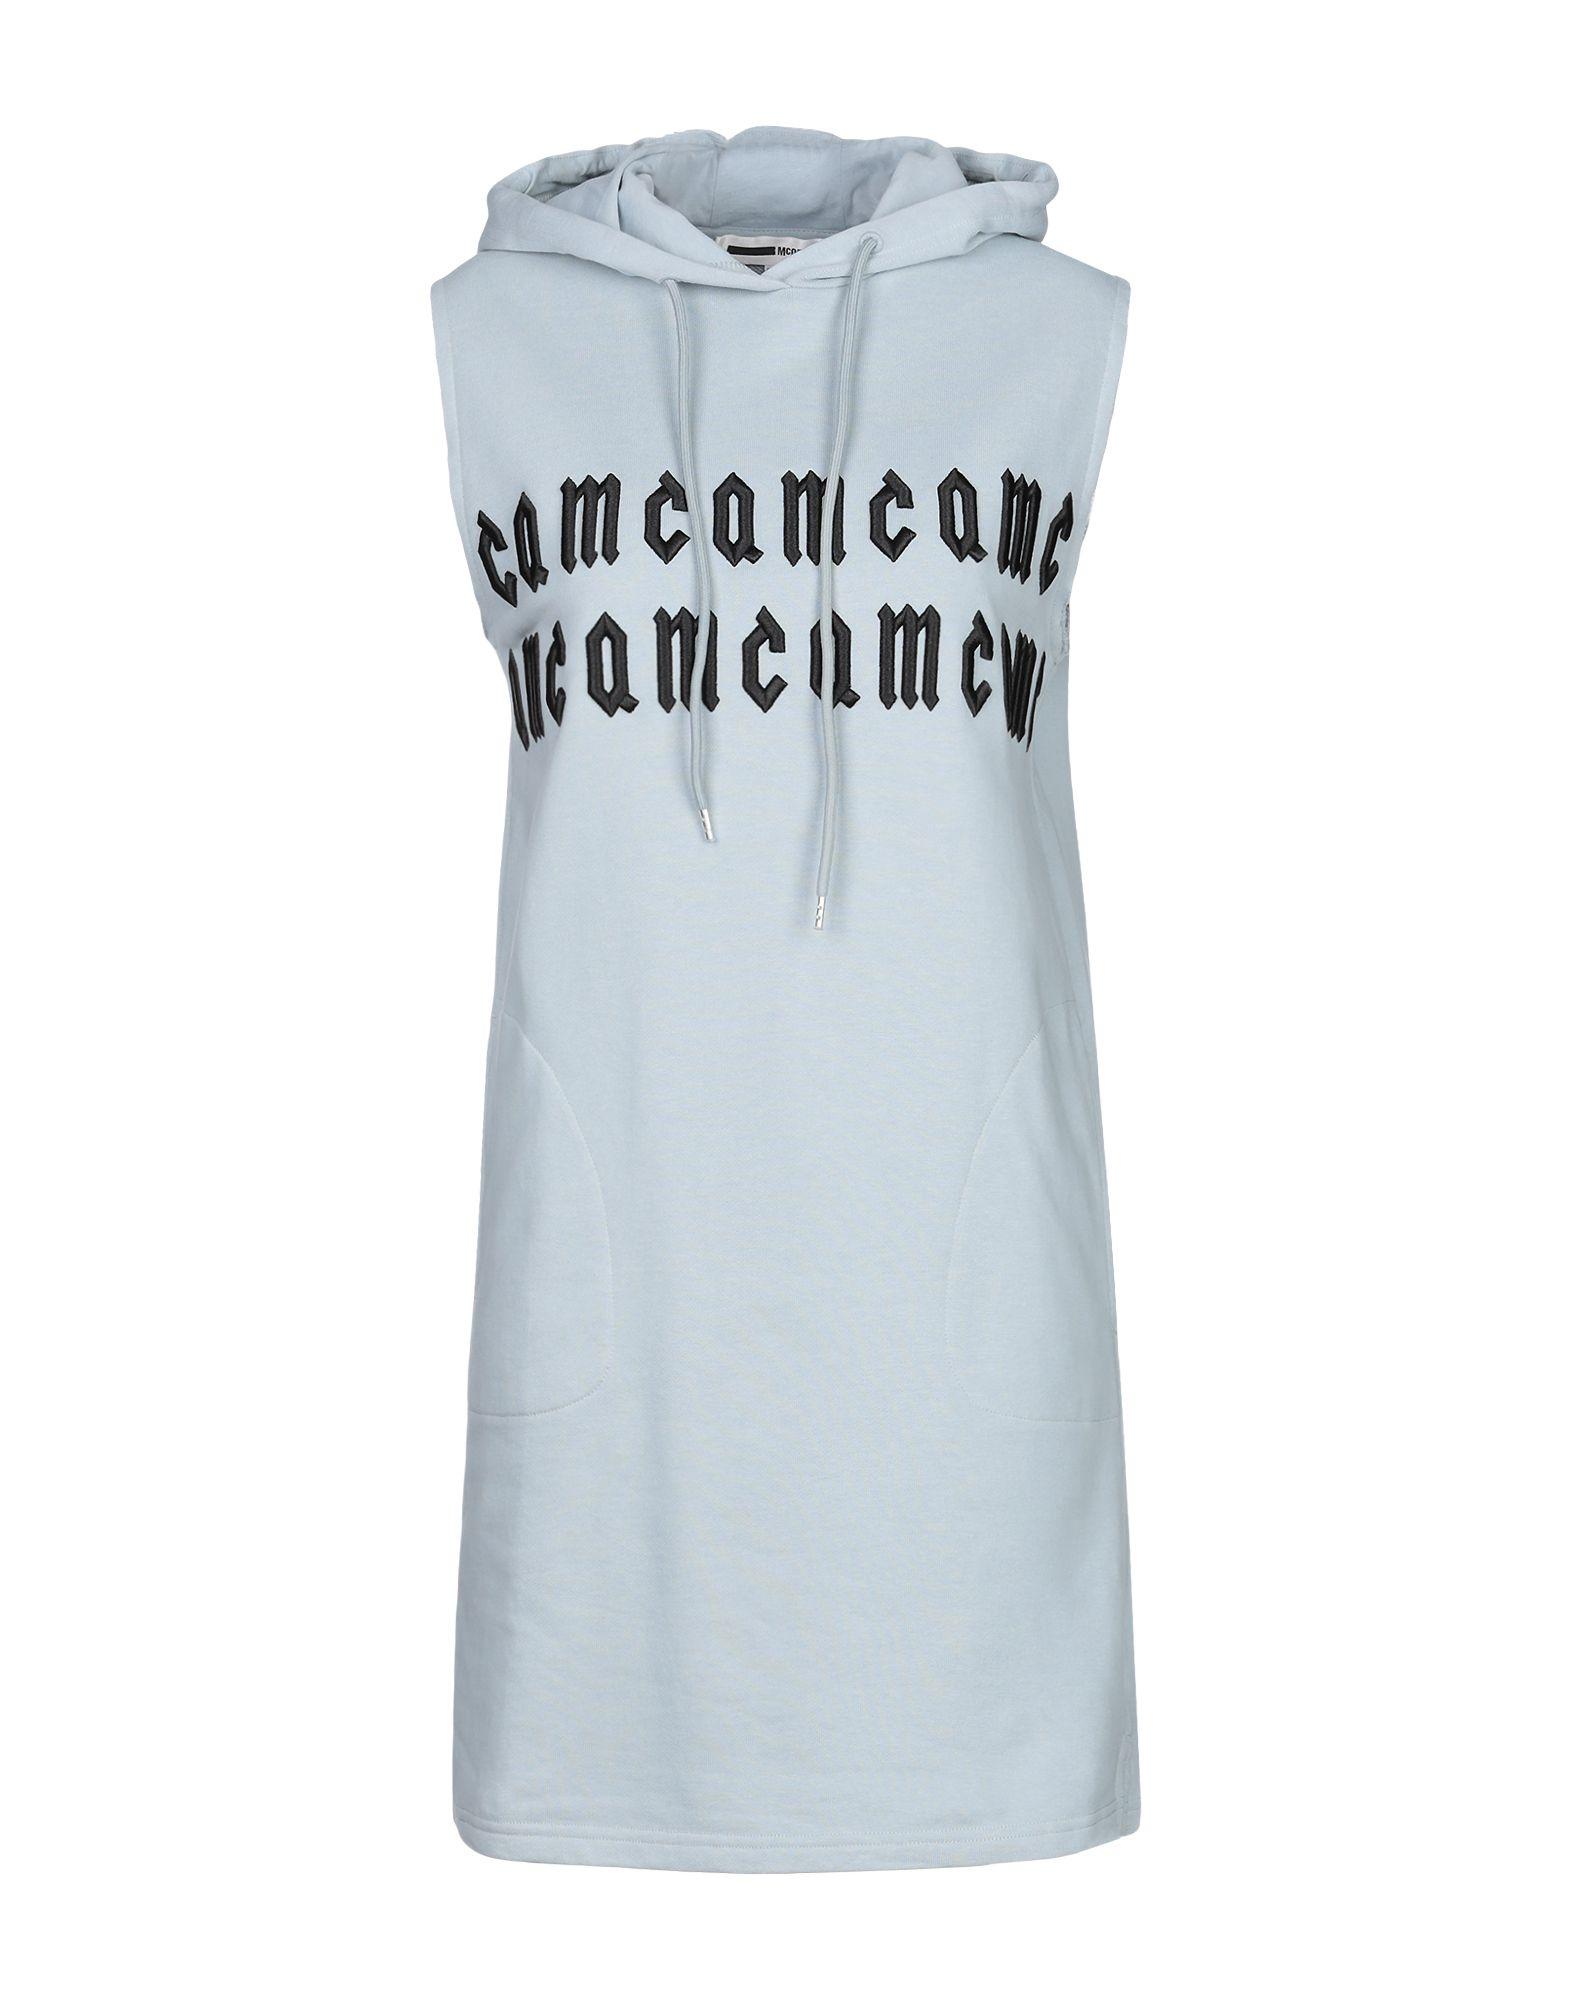 Фото - McQ Alexander McQueen Короткое платье mcq alexander mcqueen топ без рукавов